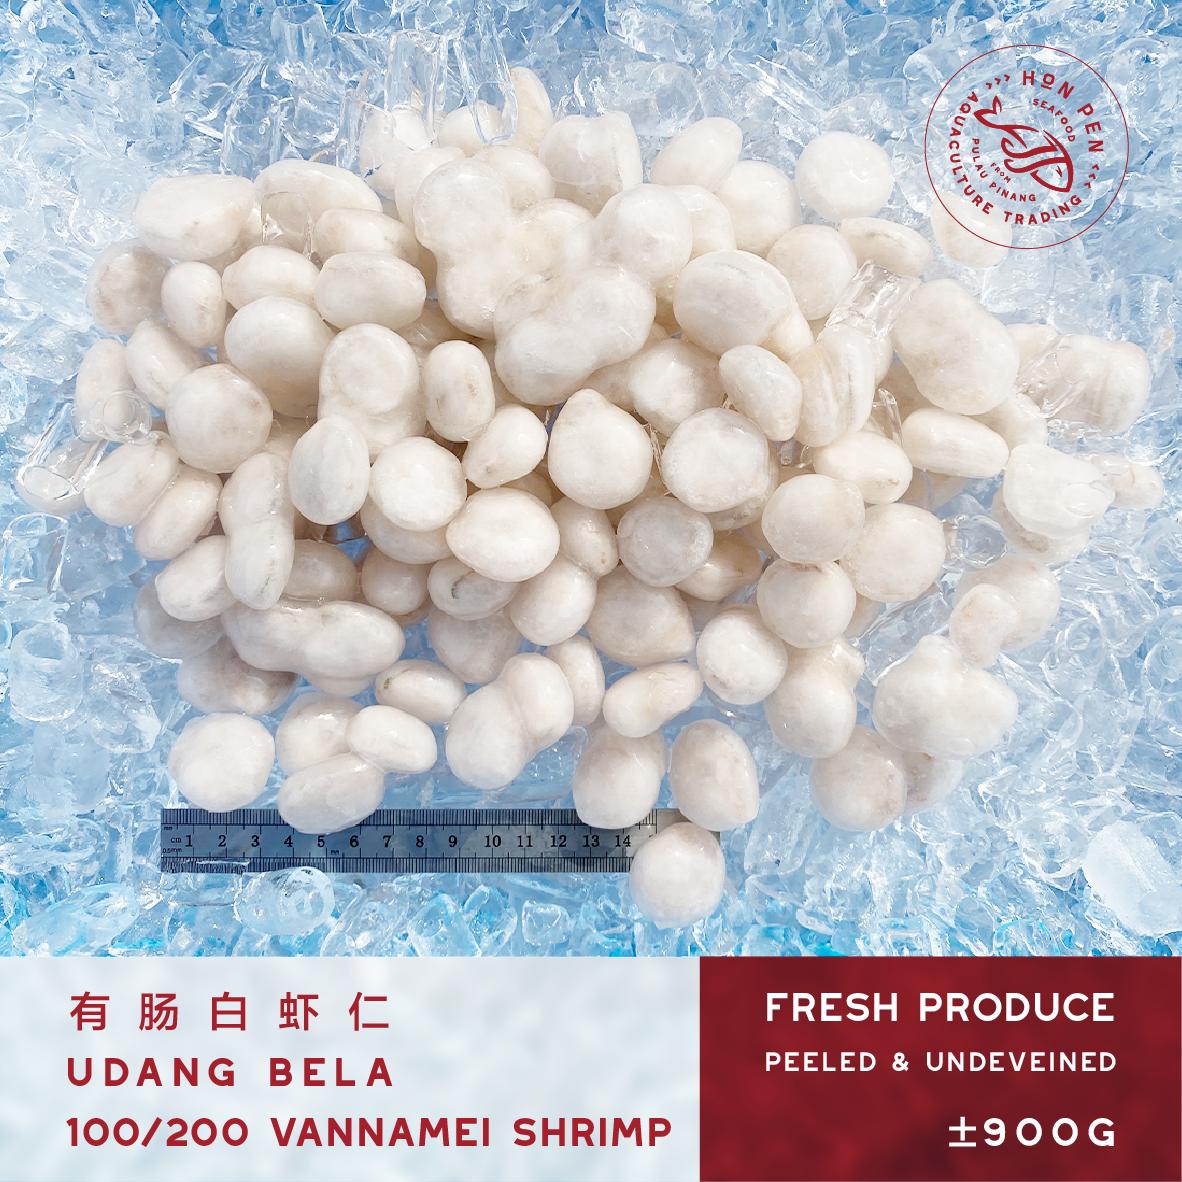 VANNAMEI SHRIMP 100/200 有肠白虾仁 UDANG BELA (Peeled & Undeveined) ±900g